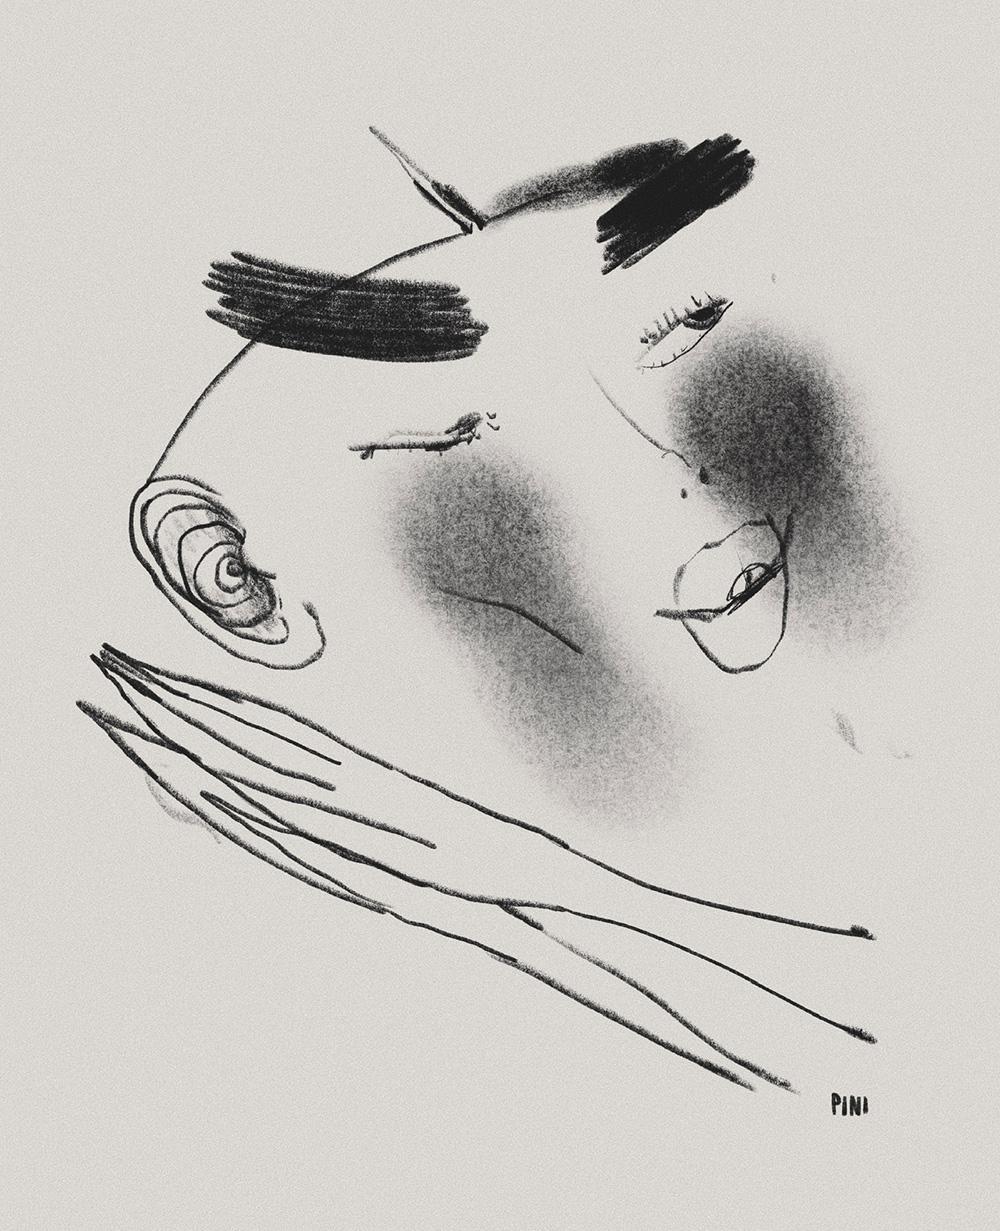 Nick Pini Fashion Illustrator